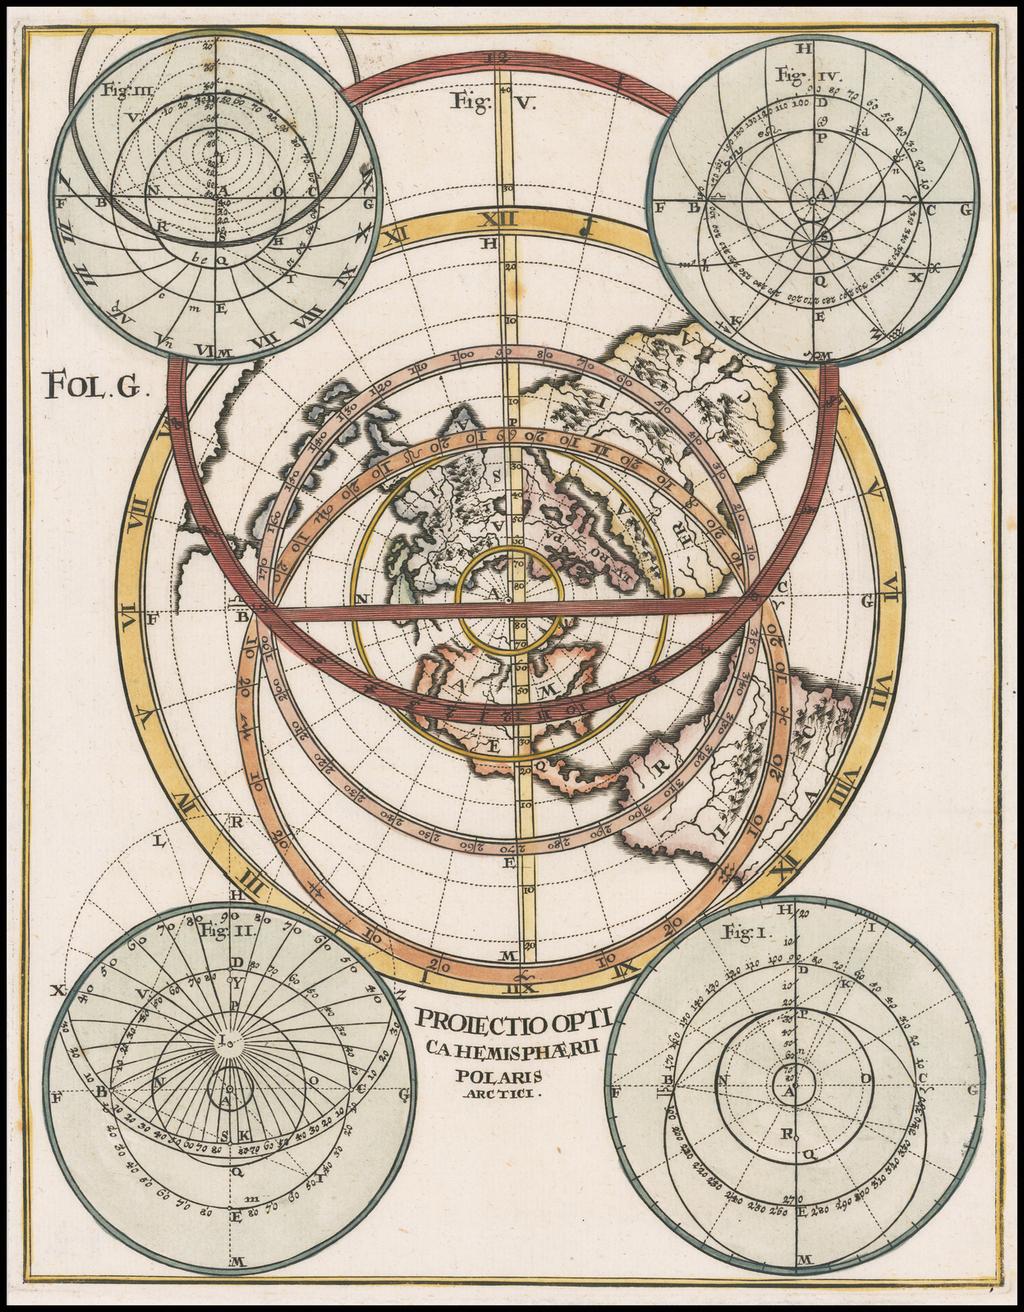 [Proietio Optica Hemisphaerii Polaris Arctici] By Heinrich Scherer